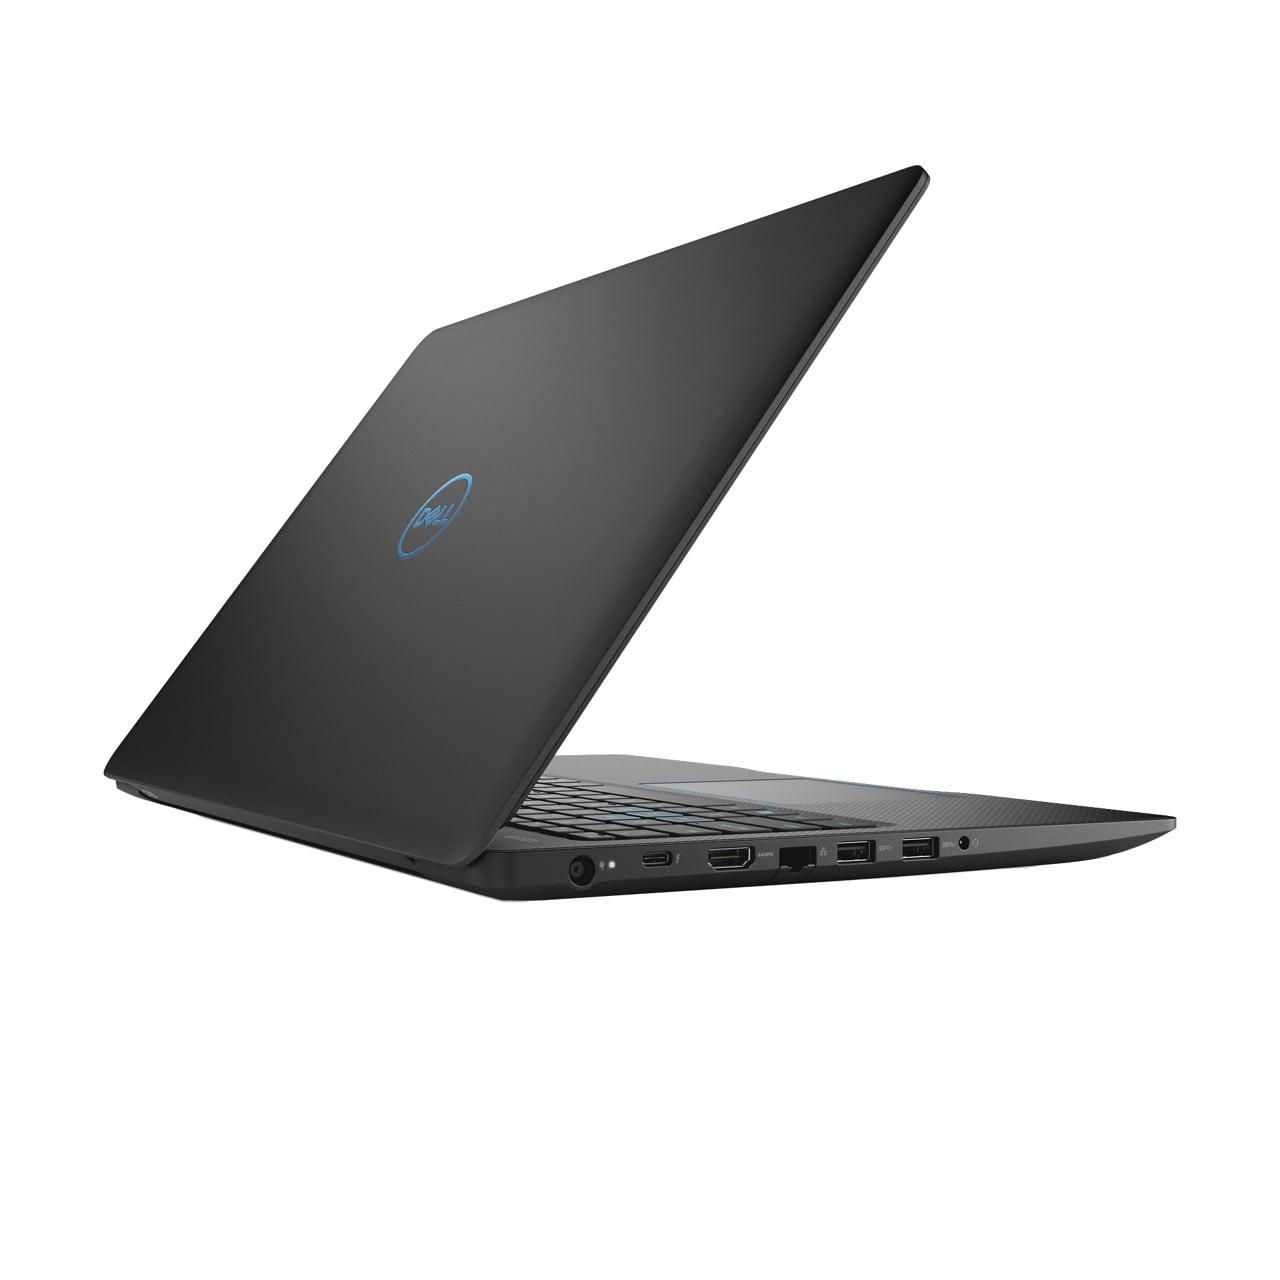 Dell G3 Gaming Laptop 15.6u0022 Full HD, Intel Core i7-8750H, NVIDIA GeForce GTX 1050 Ti 4GB, 1TB HDD Storage, 24GB Total Memory (8GB + 16GB Intel Optane), G3579-7283BLK-PUS